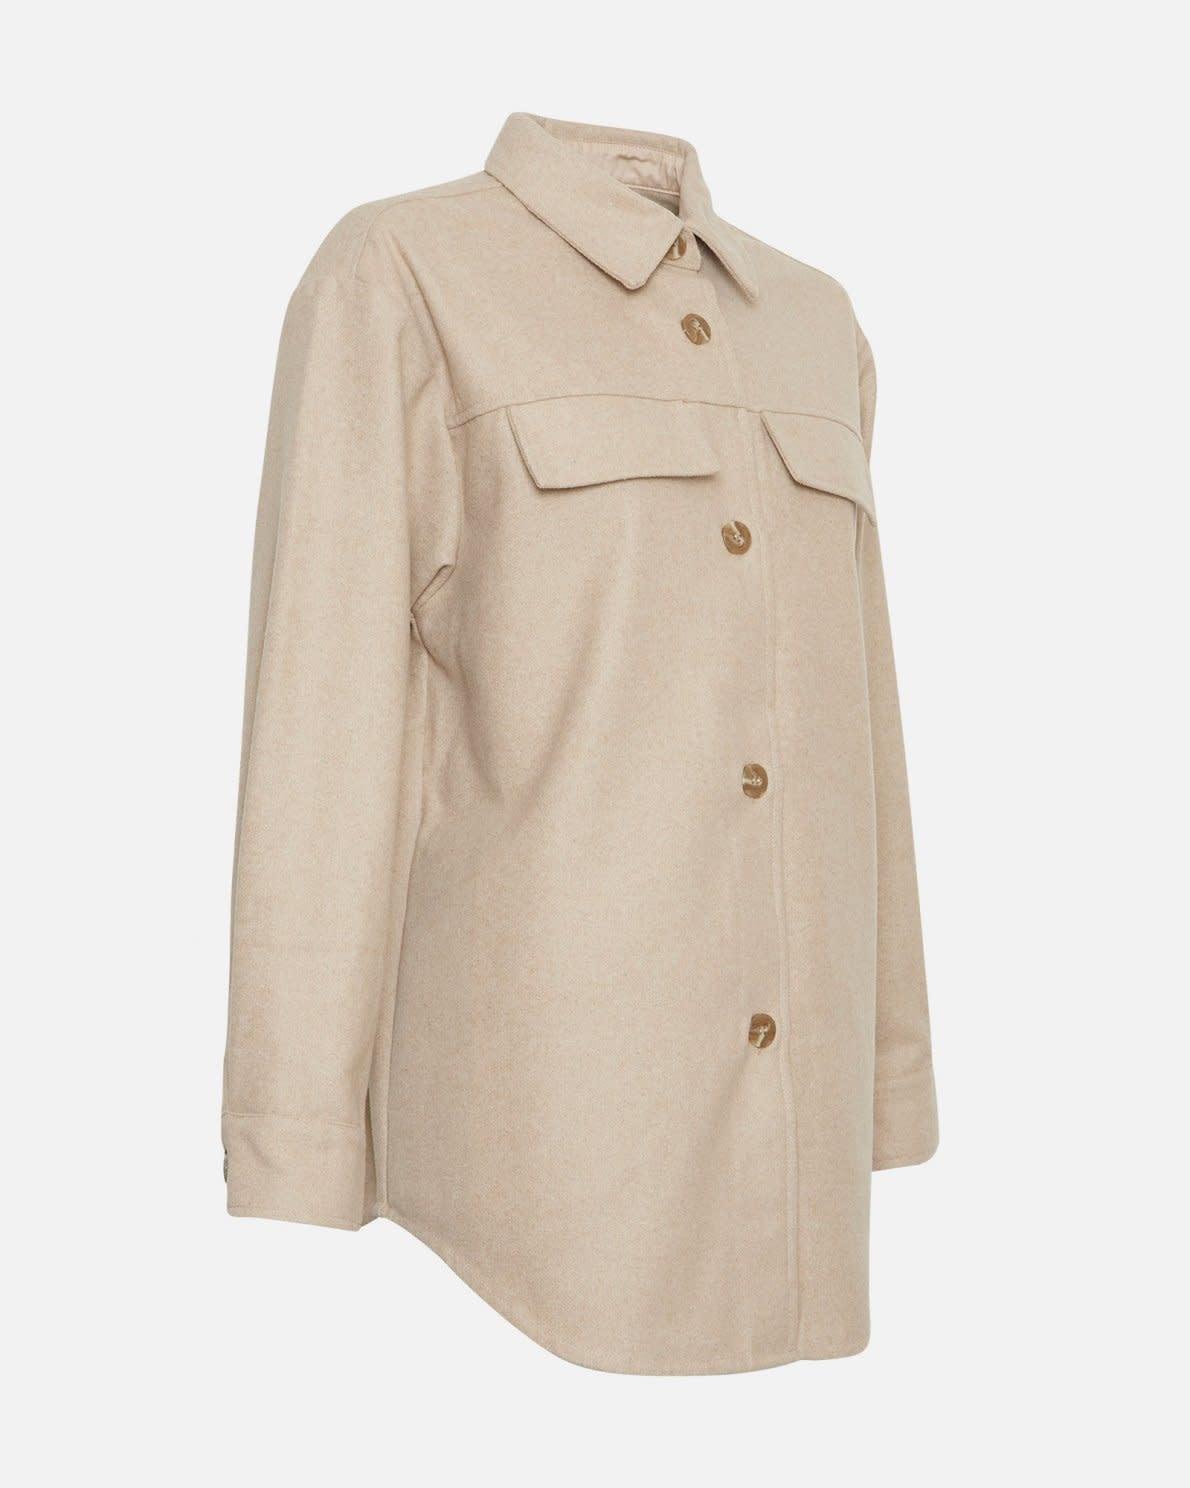 Maude White Pepper Overshirt Jacket-2